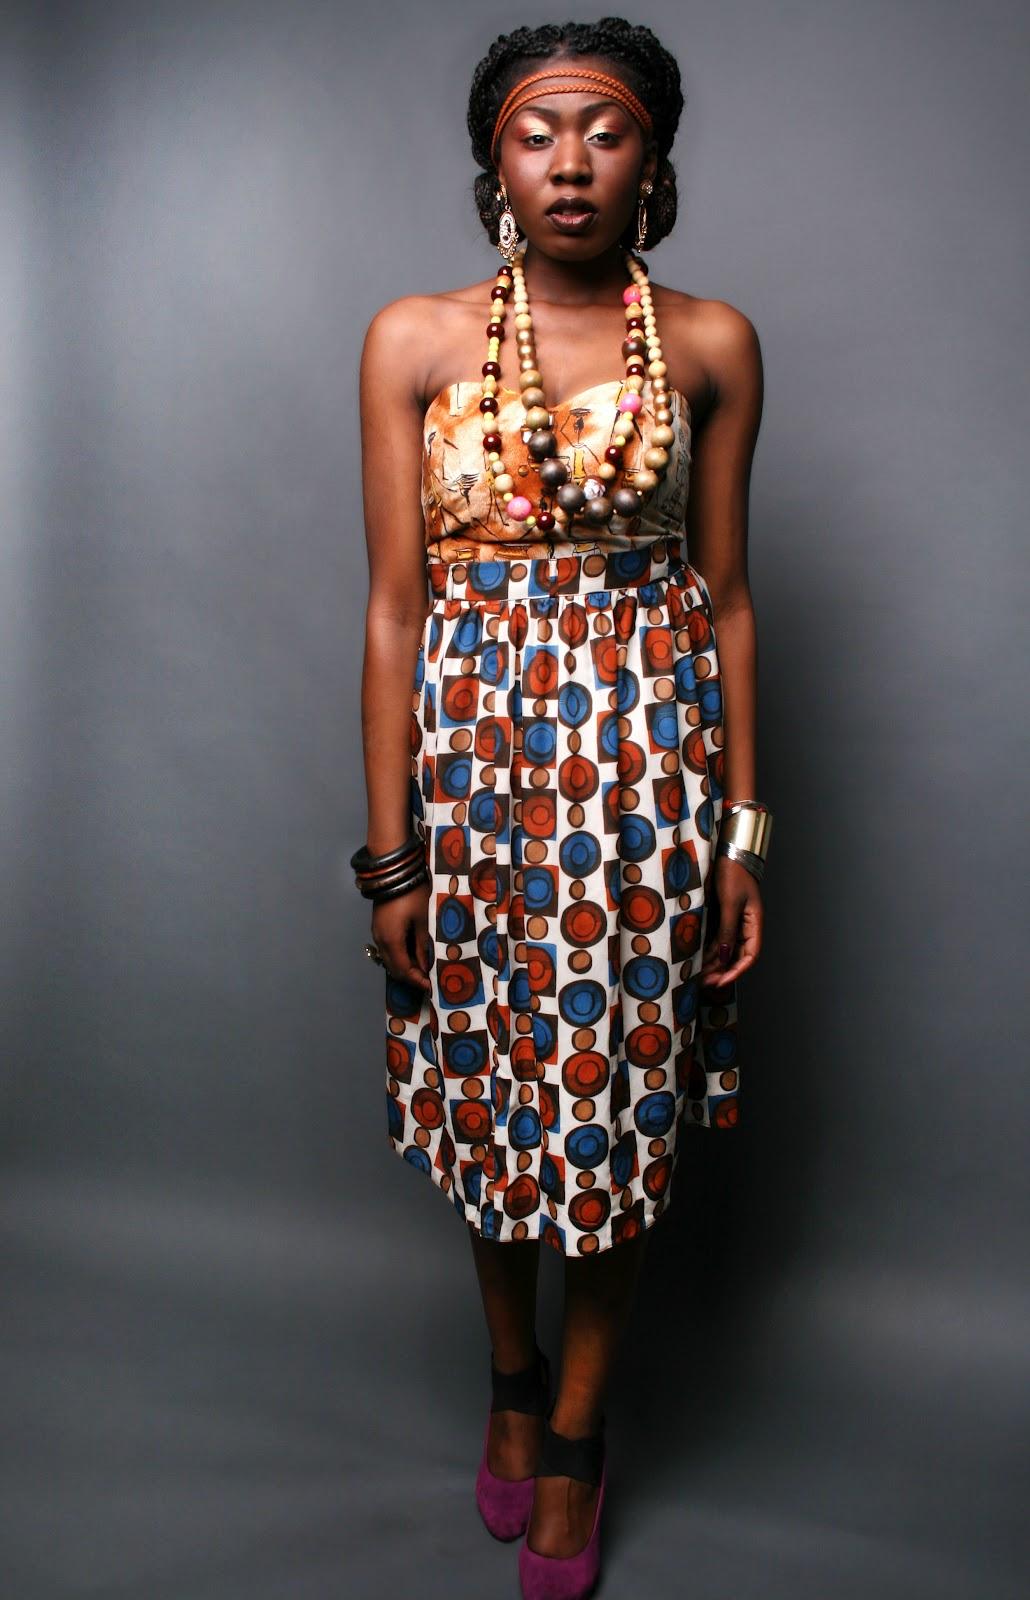 Modern african dresses 2012 african princess walking into